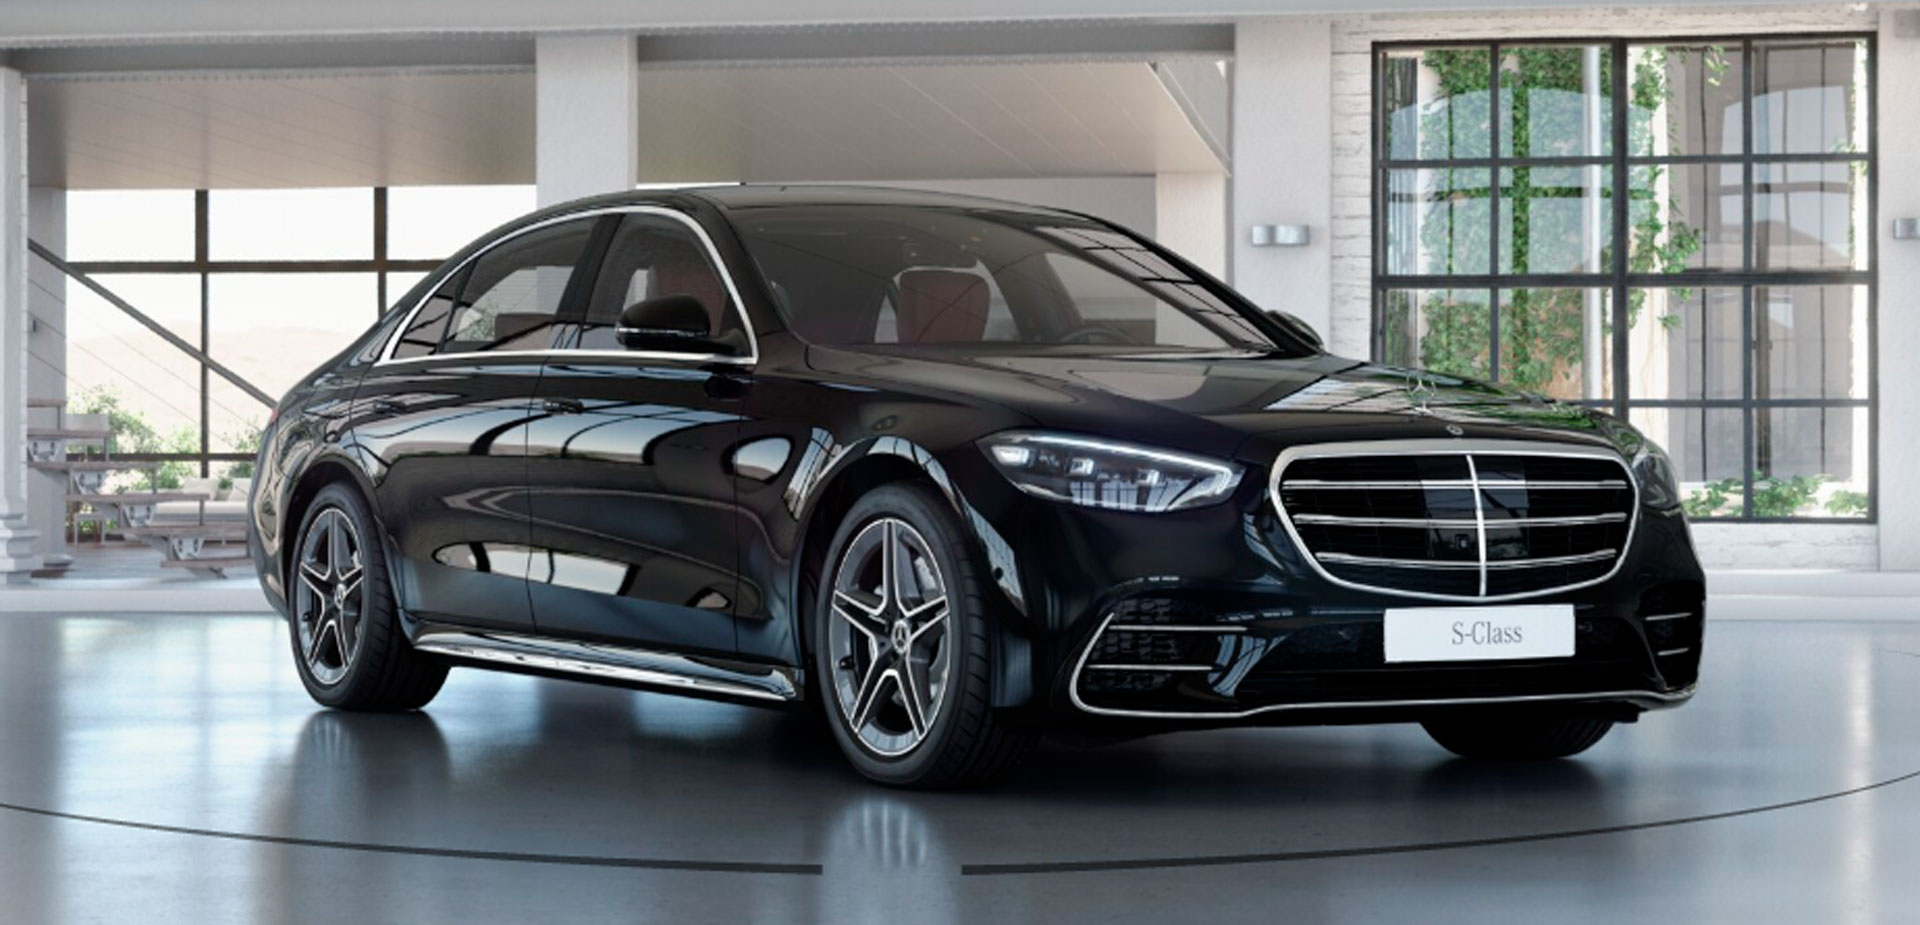 Mercedes-Benz S-Class Limousine 0152620133